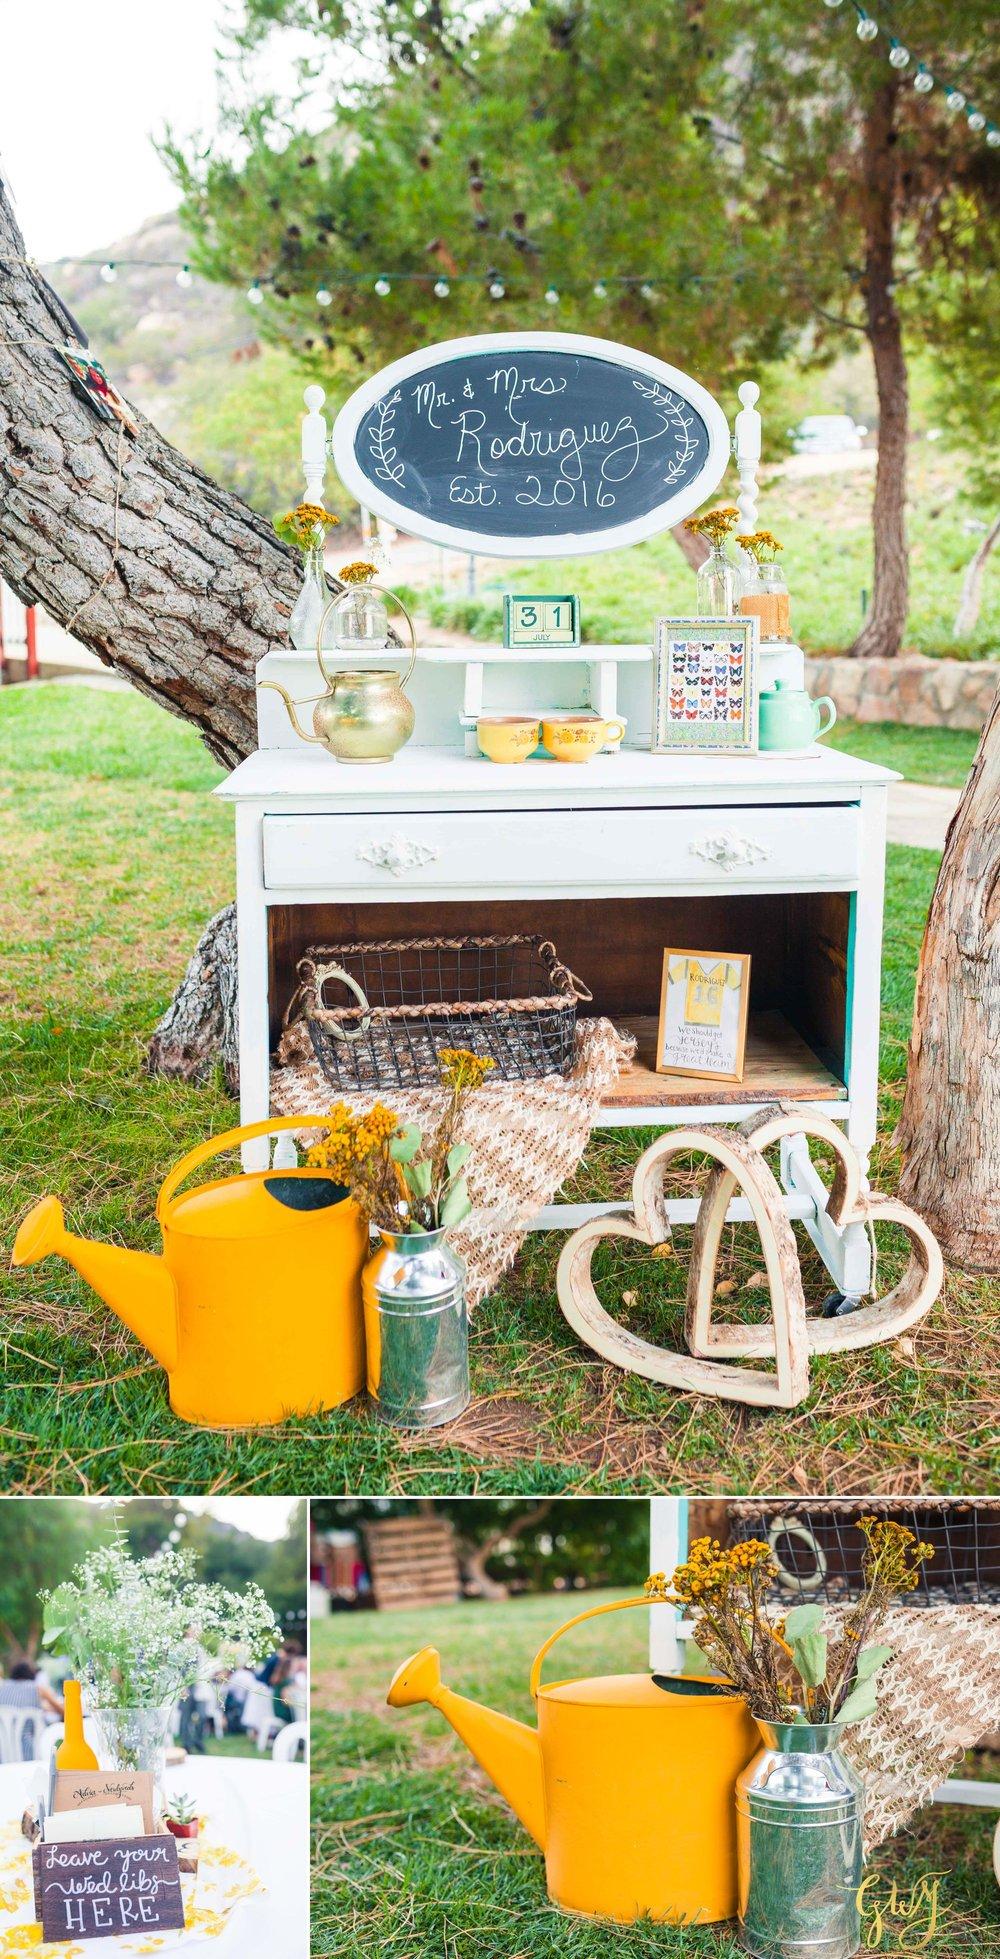 Hannah + Lorenzo Secluded Garden Estate Temecula DIY Wedding by Glass Woods Media 25.jpg